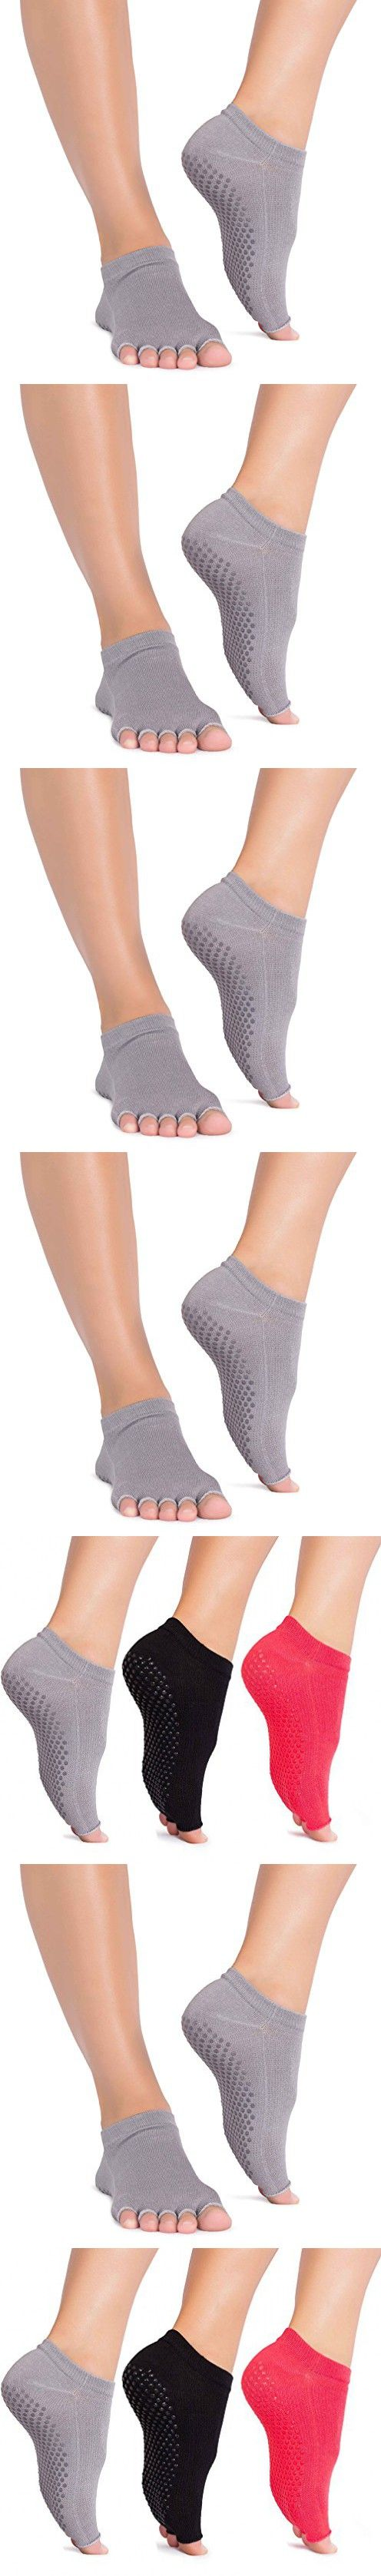 Open 5-Toe Non Skid Grip Socks for Women Toe Socks for Yoga and Pilates [ On Sale Today! ] (Gray)